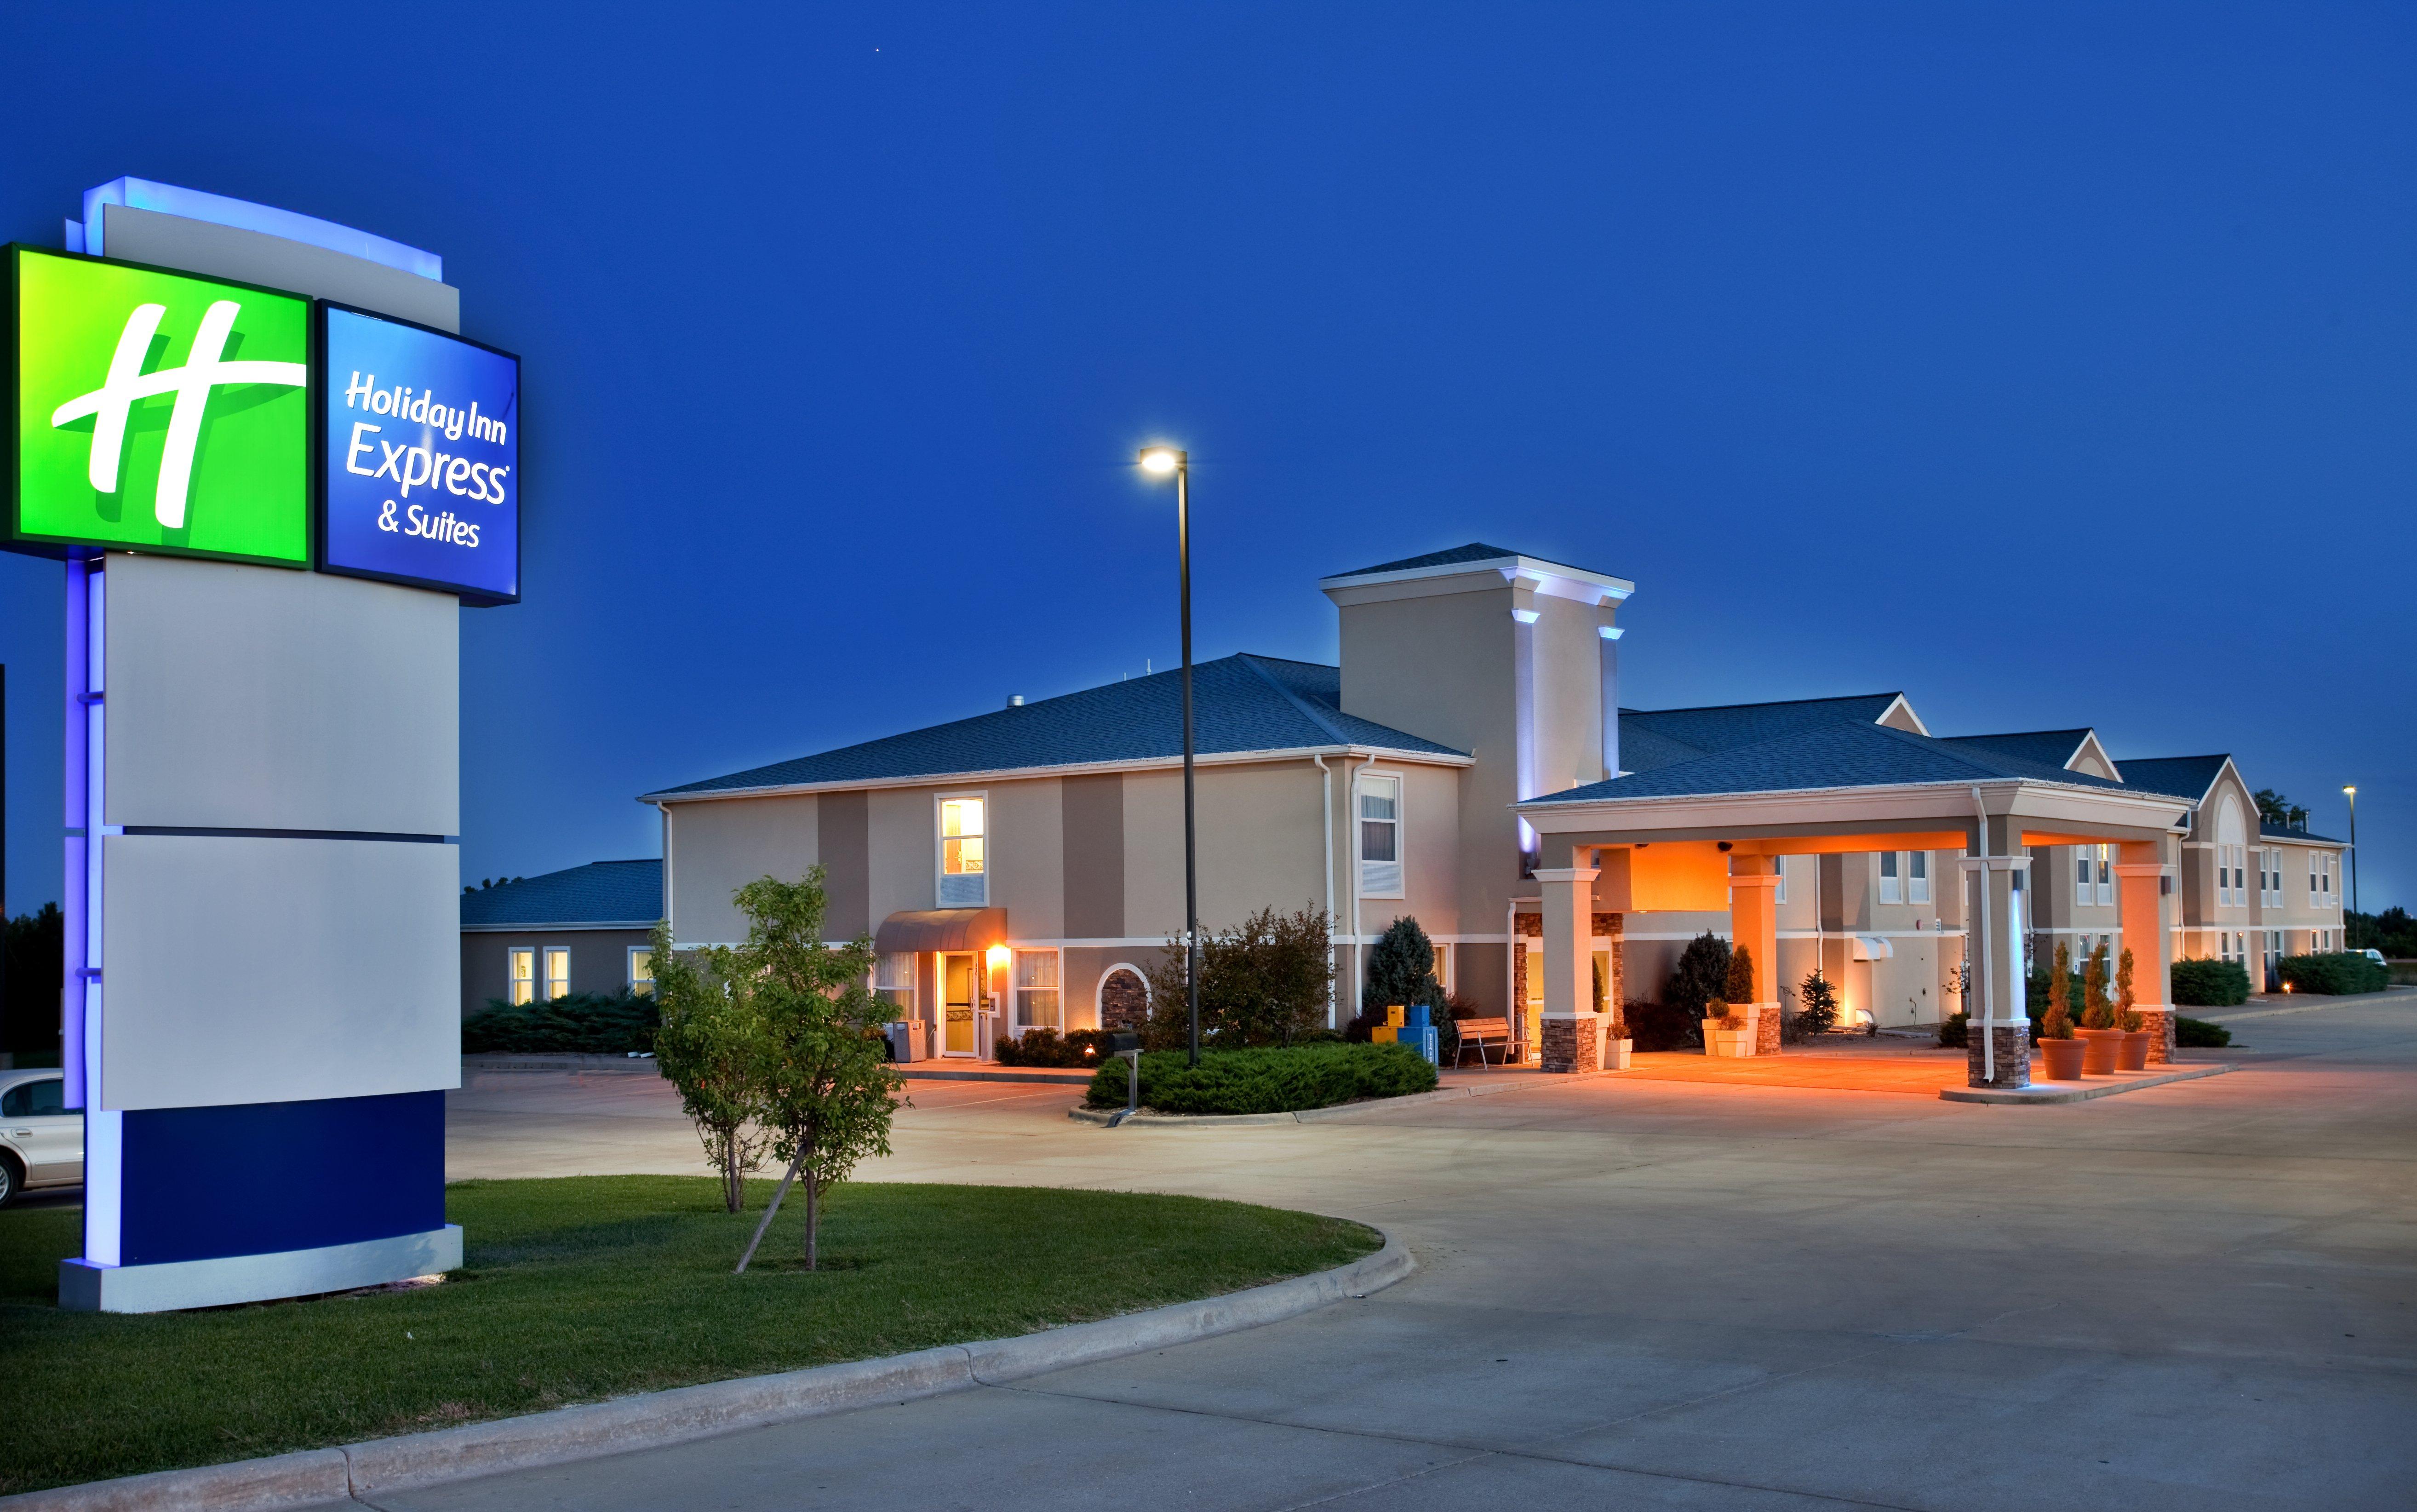 Holiday Inn Express & Suites Abilene